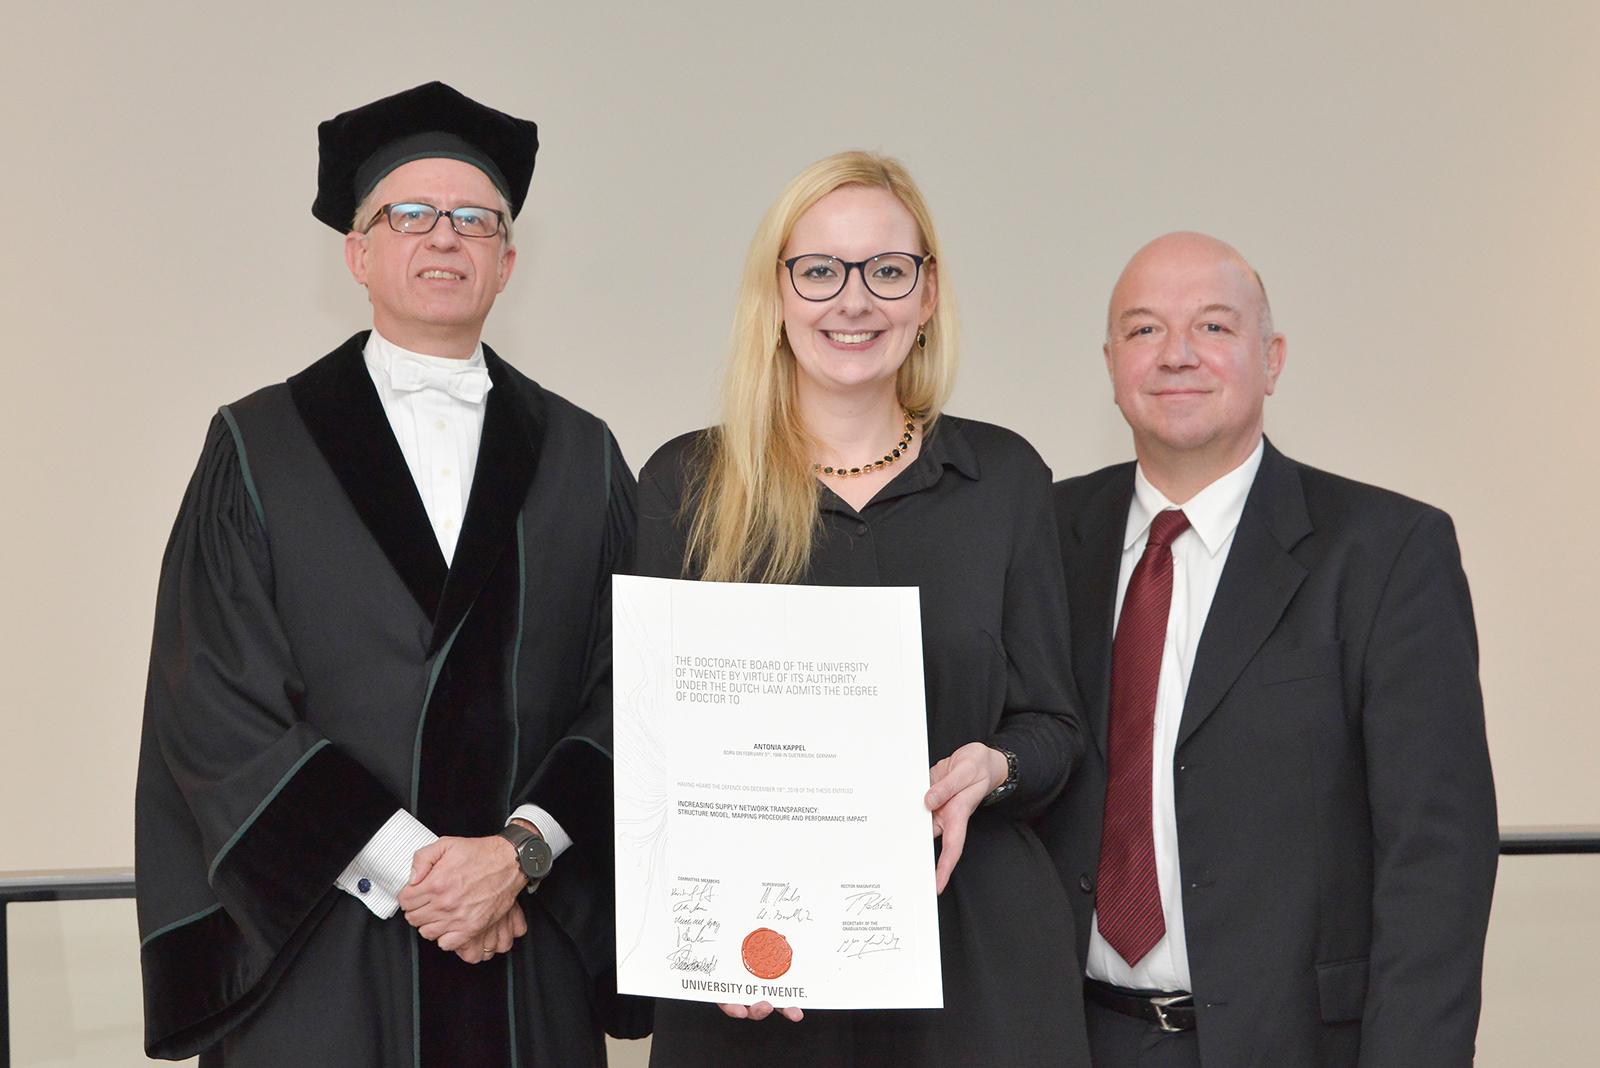 Prof. Schiele, Dr. Kappel, Prof. Buchholz